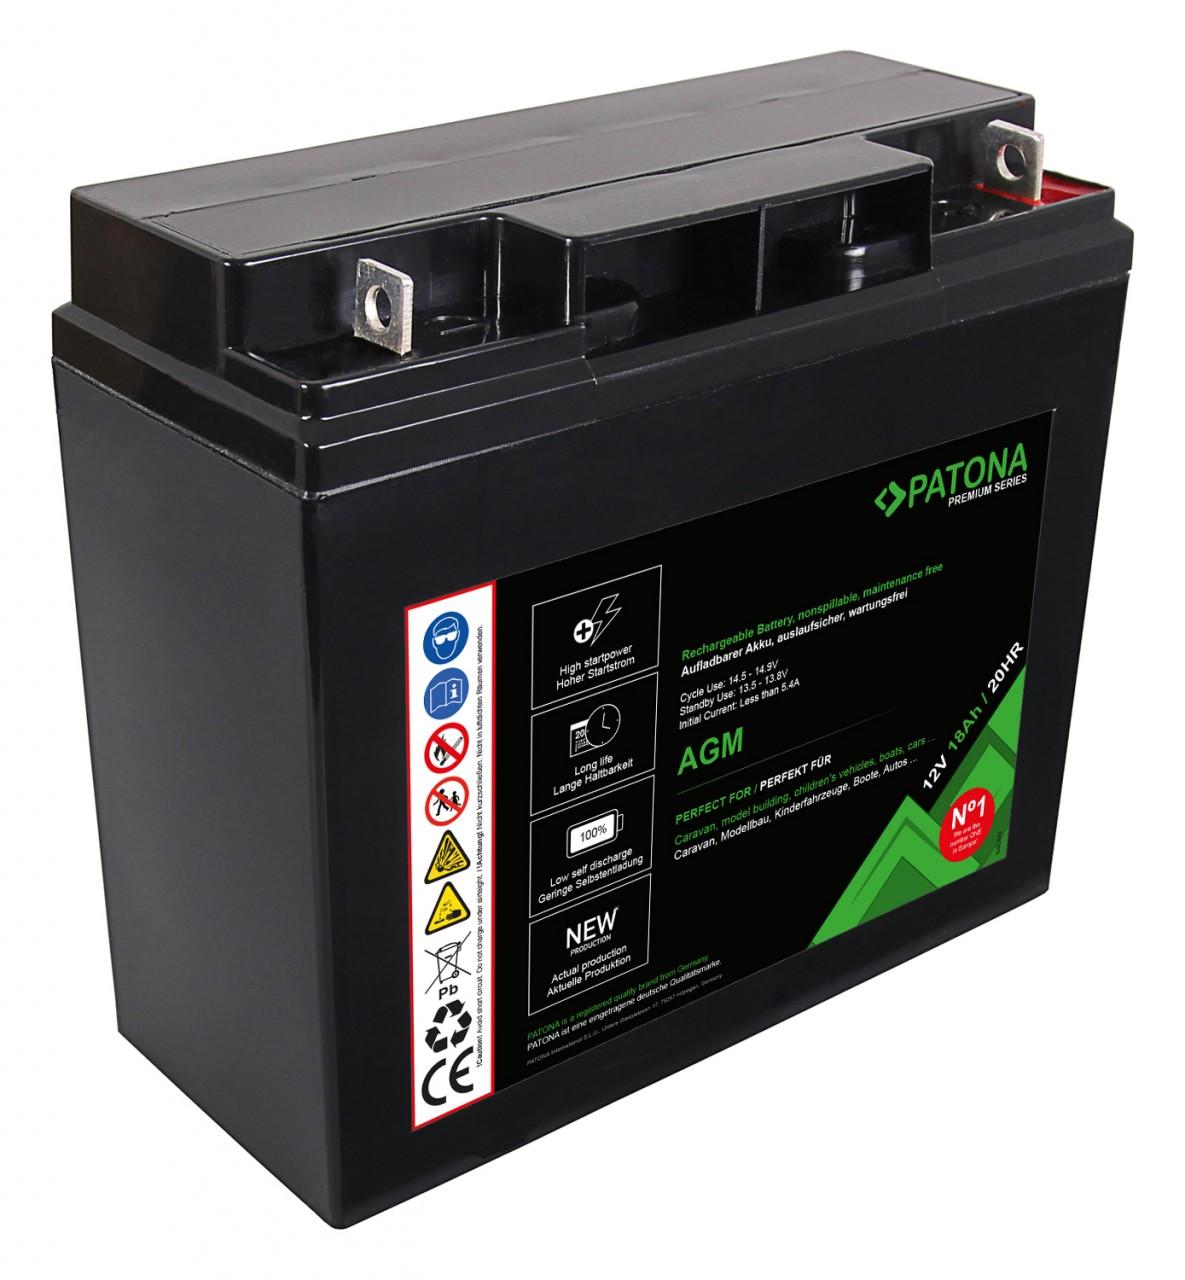 PATONA Premium AGM Lead Battery 12V 18Ah 20HR